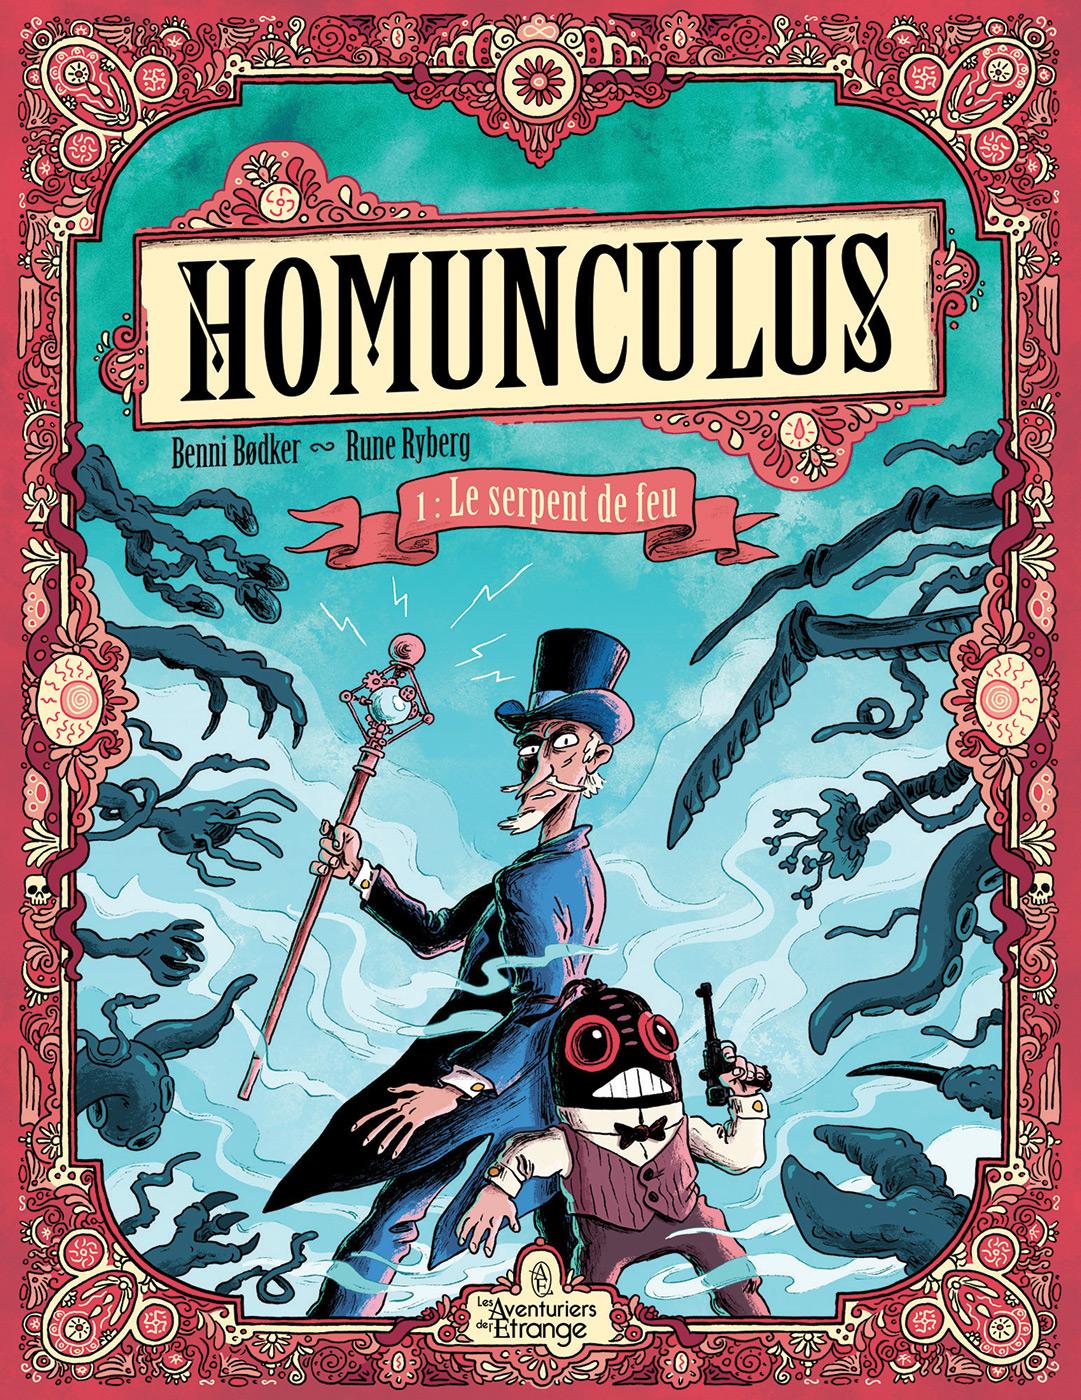 Homunculus by Rune Ryberg and Benni Bødker